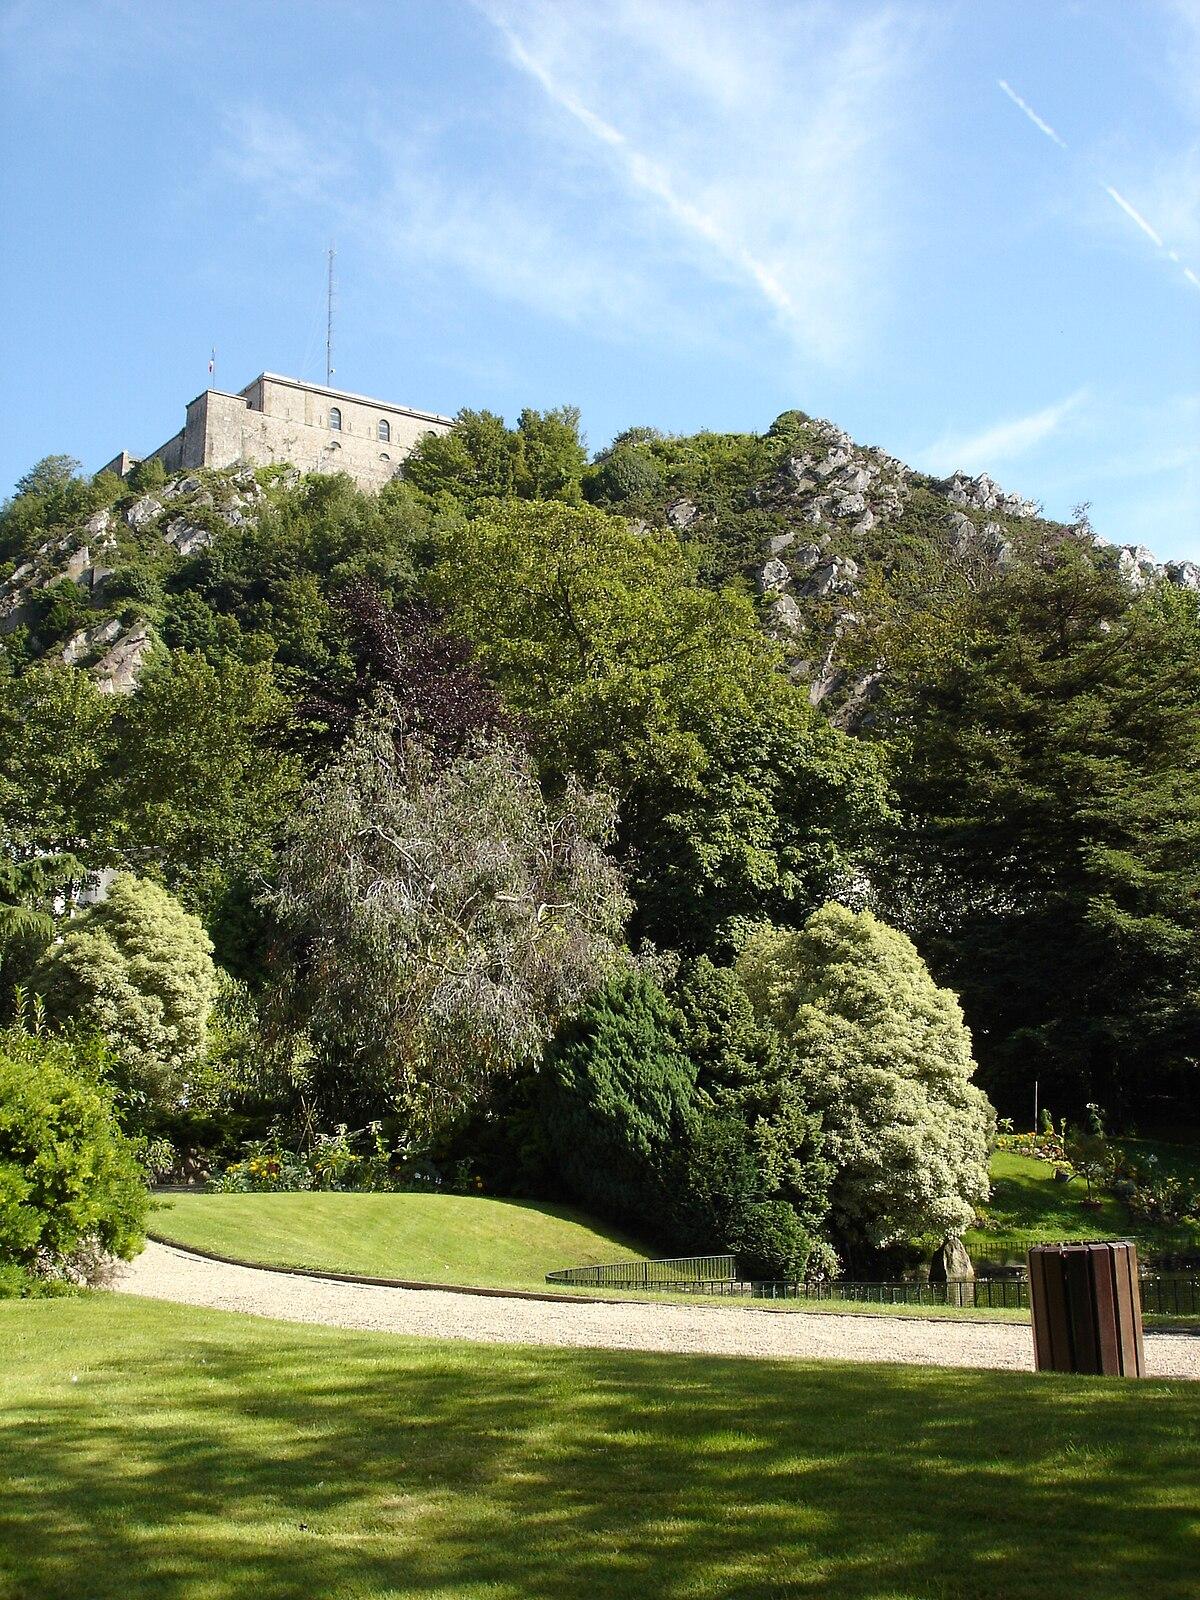 Jardin public de cherbourg wikip dia for Jardin public